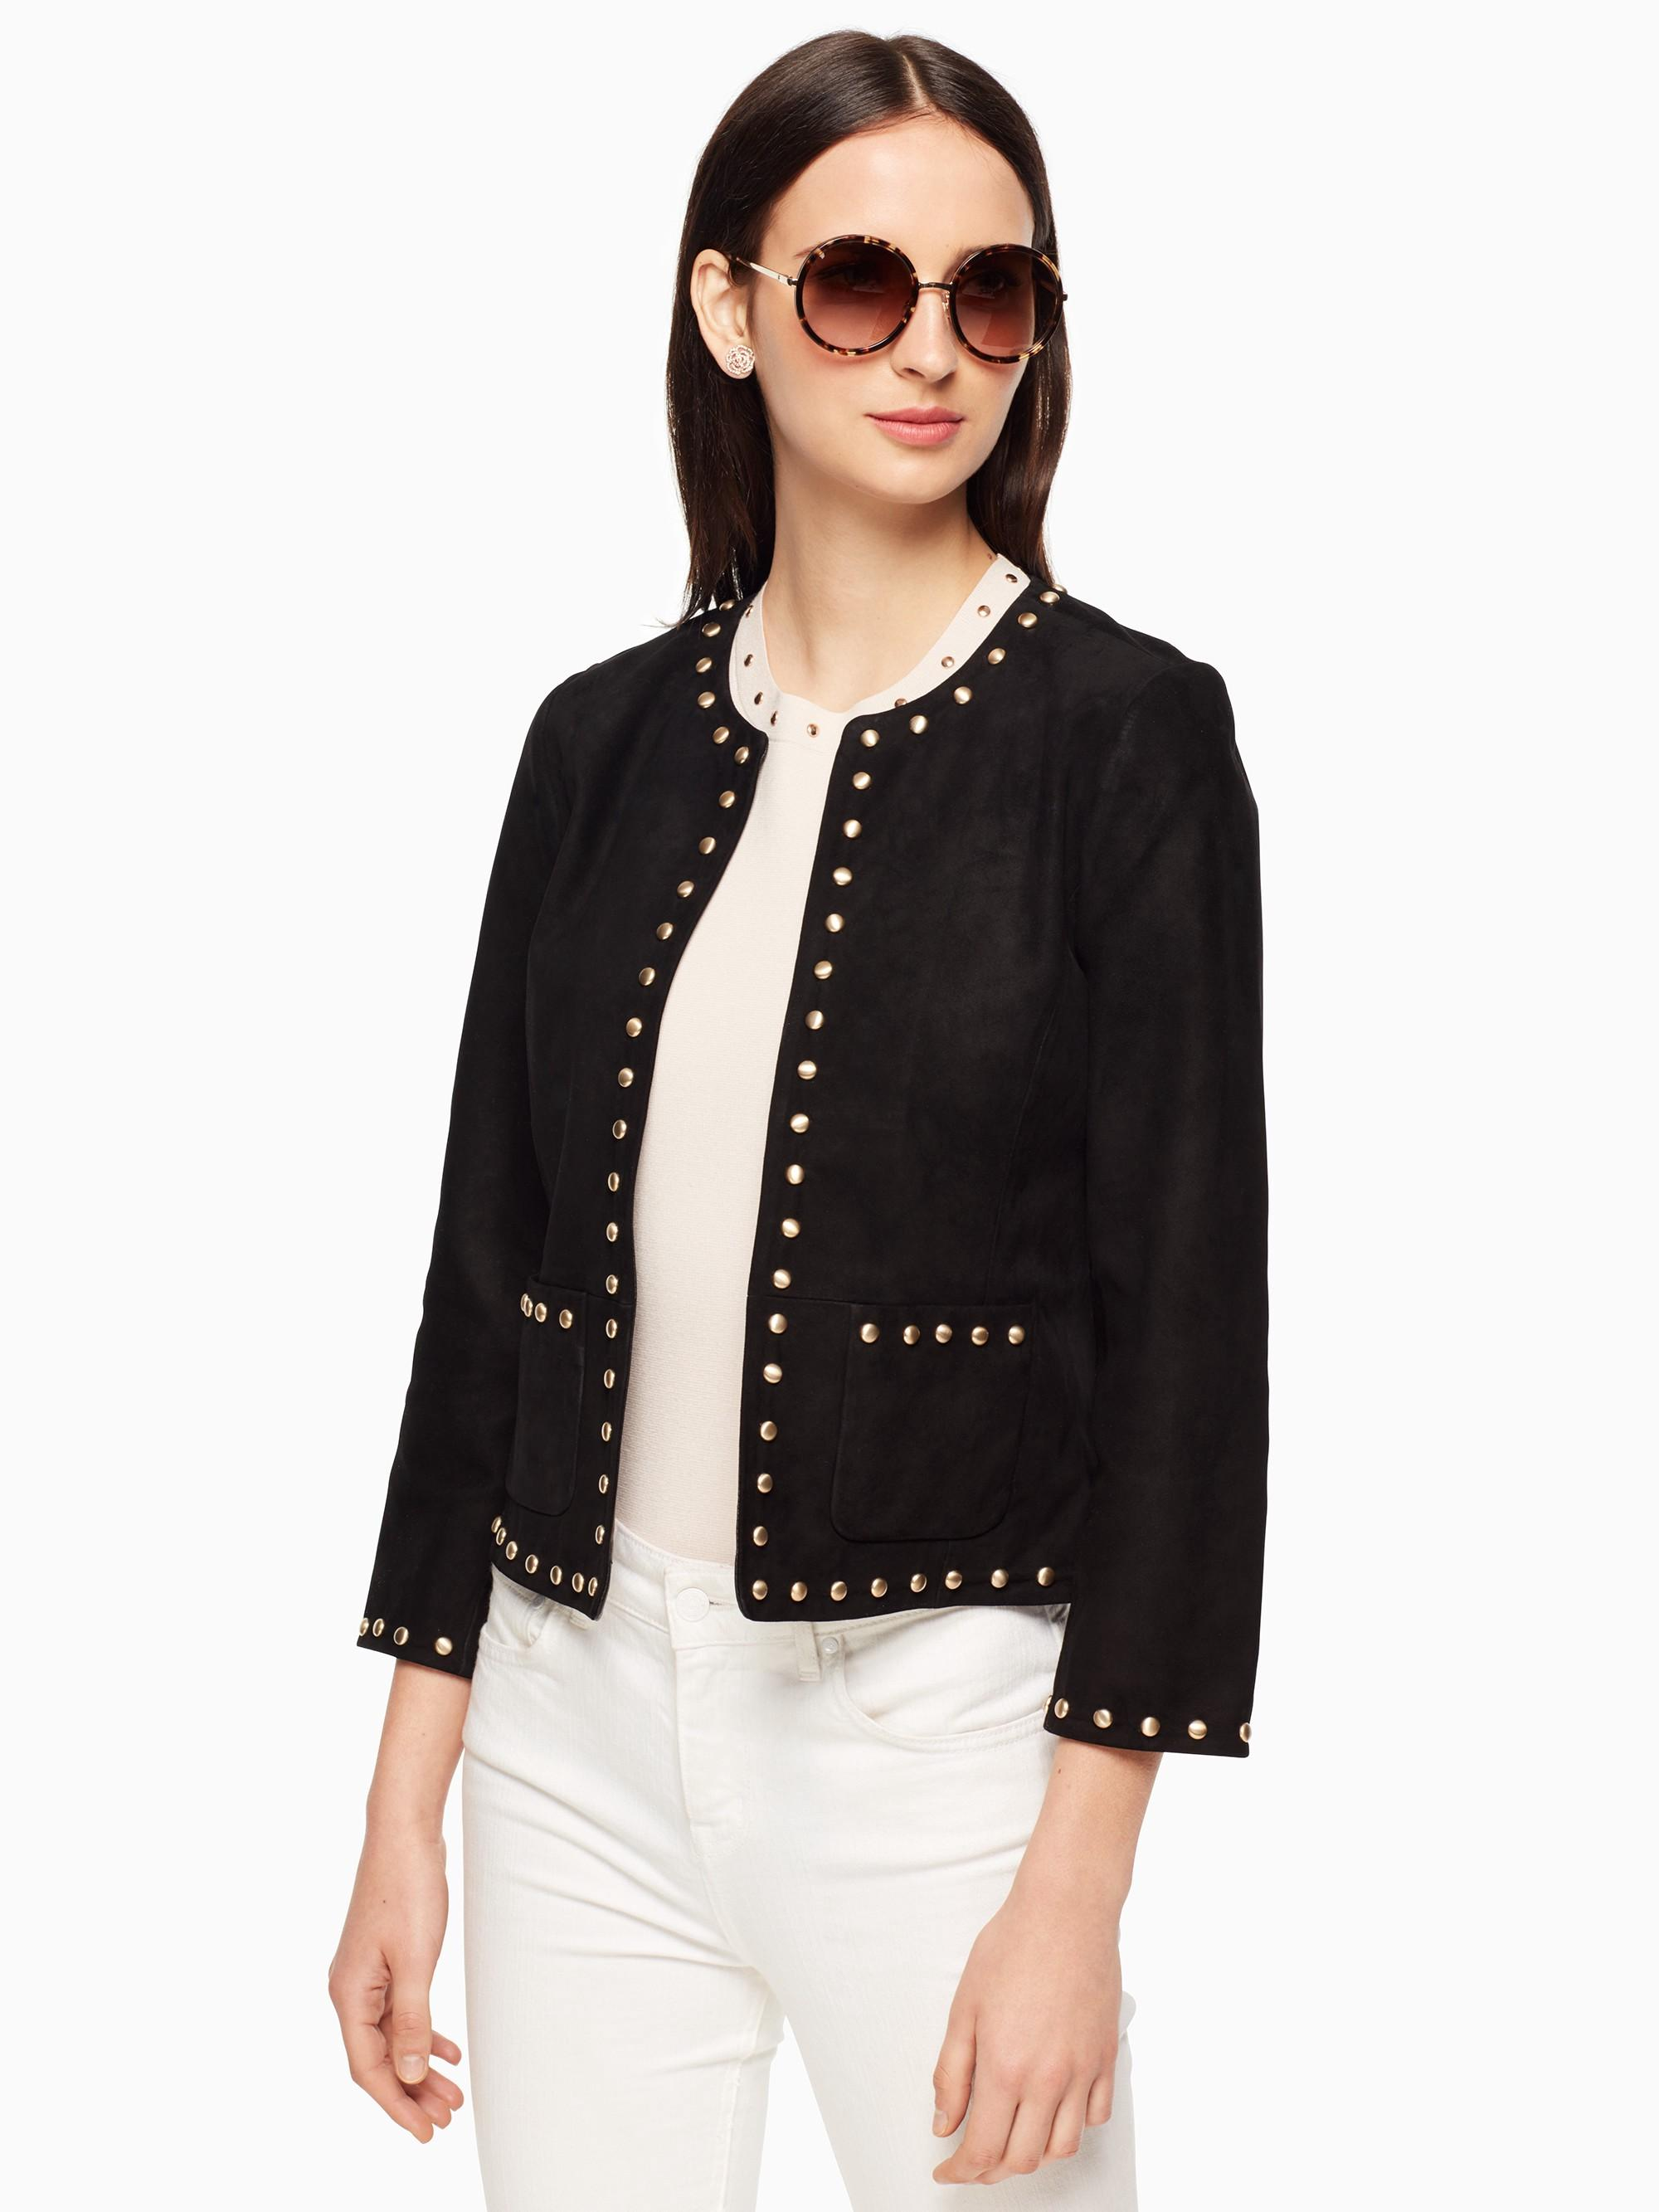 Kate Spade Studded Suede Jacket In Black